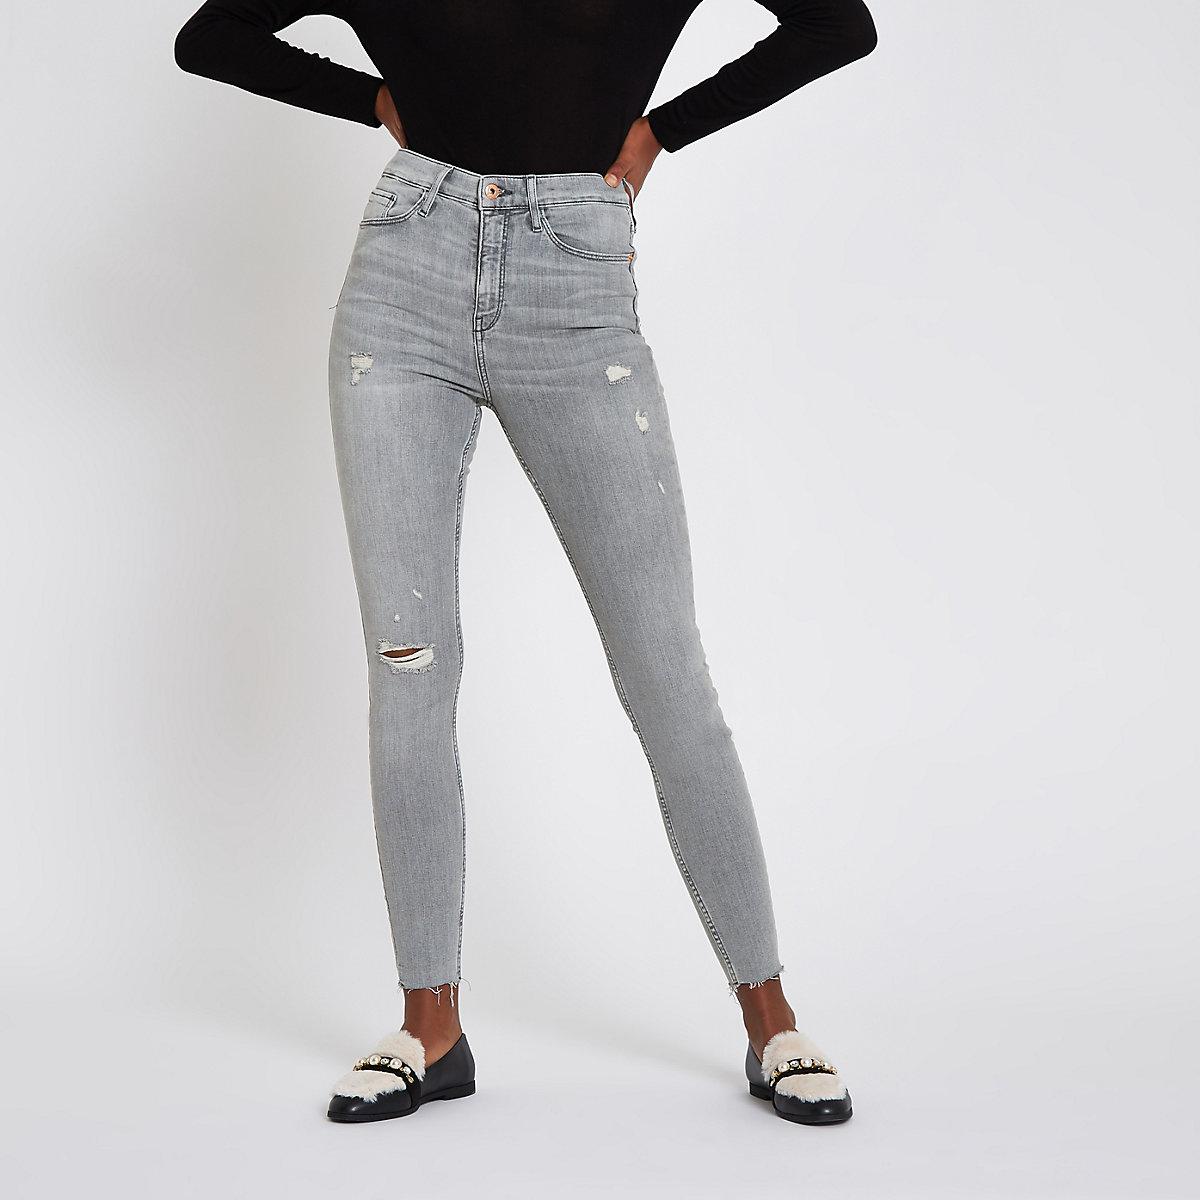 Harper - Grijze ripped superskinny jeans